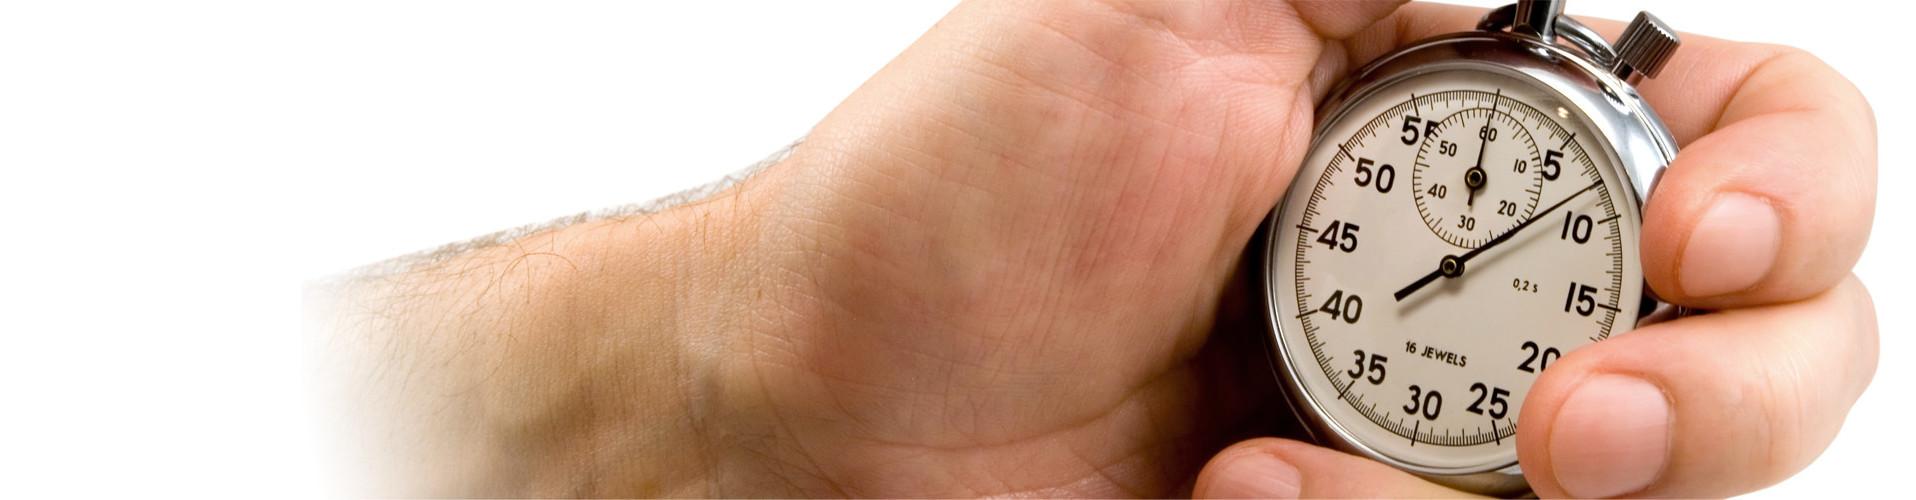 Eine Hand hält eine Stoppuhr © Aleksandr Lobanov, stock.adobe.com